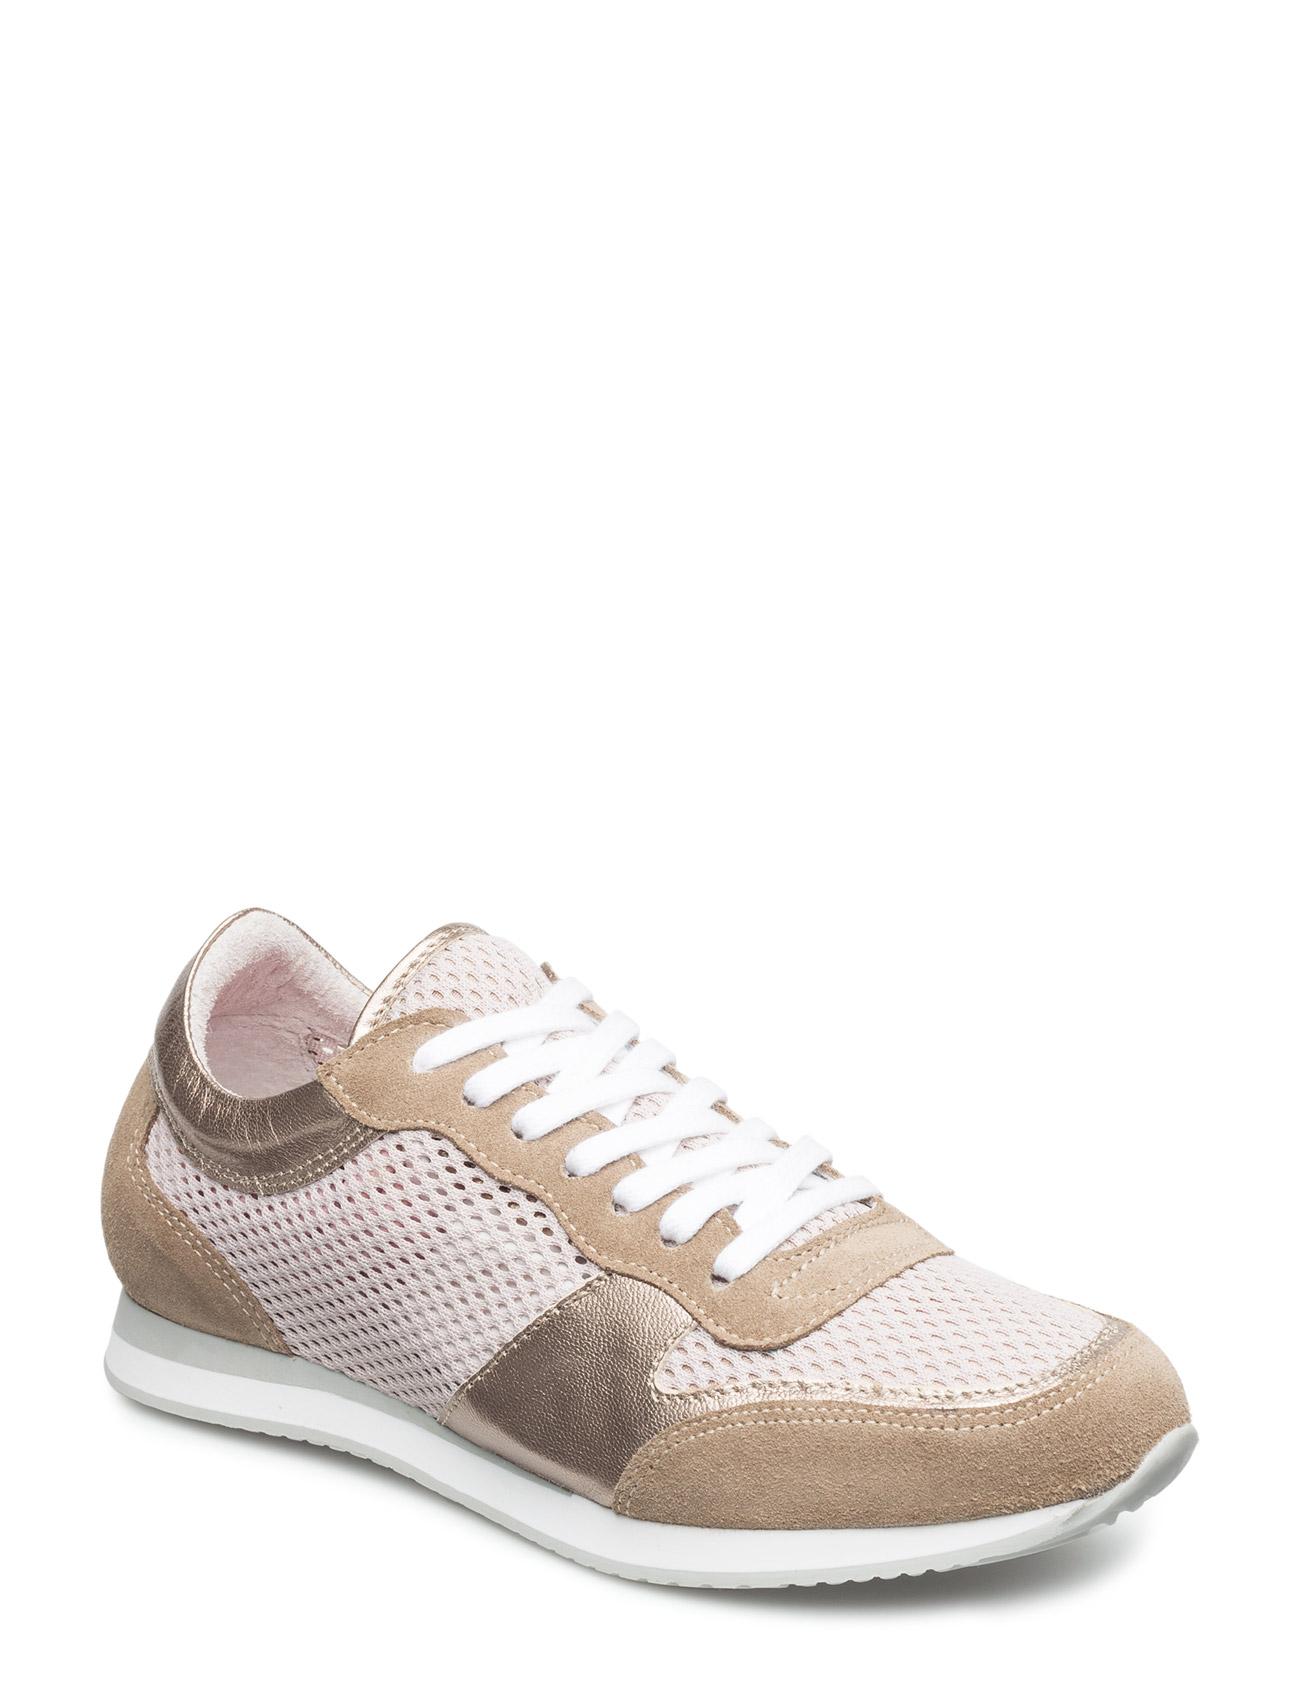 Shoes - Billi Bi Sport Billi Bi Sneakers til Damer i